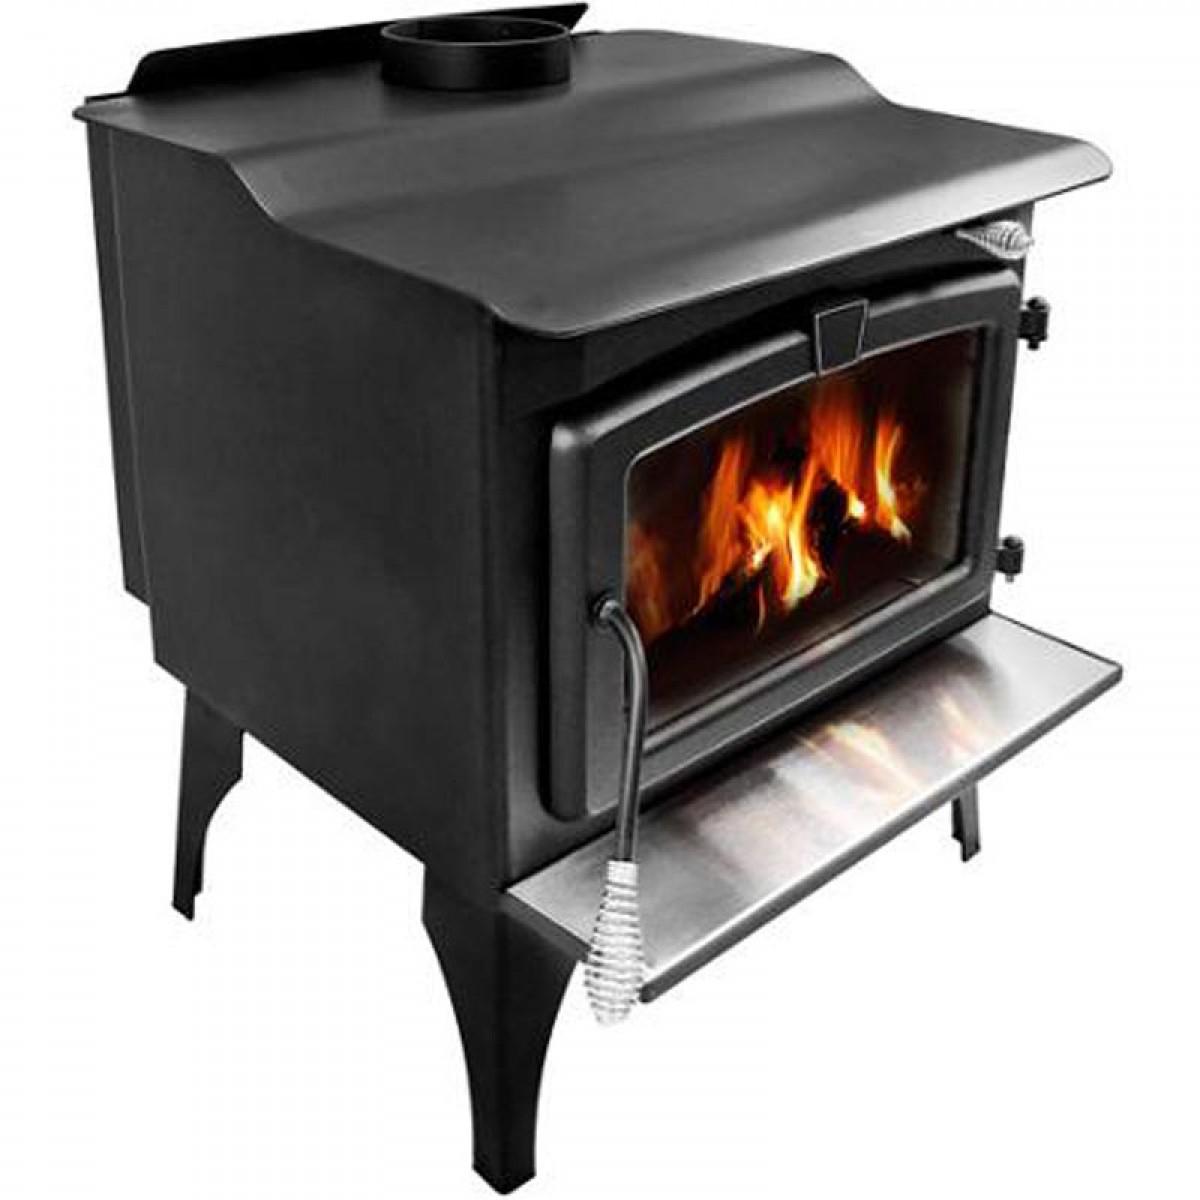 Hearth Stove: Pleasant Hearth Medium Wood Burning Stove With Legs LWS-12720